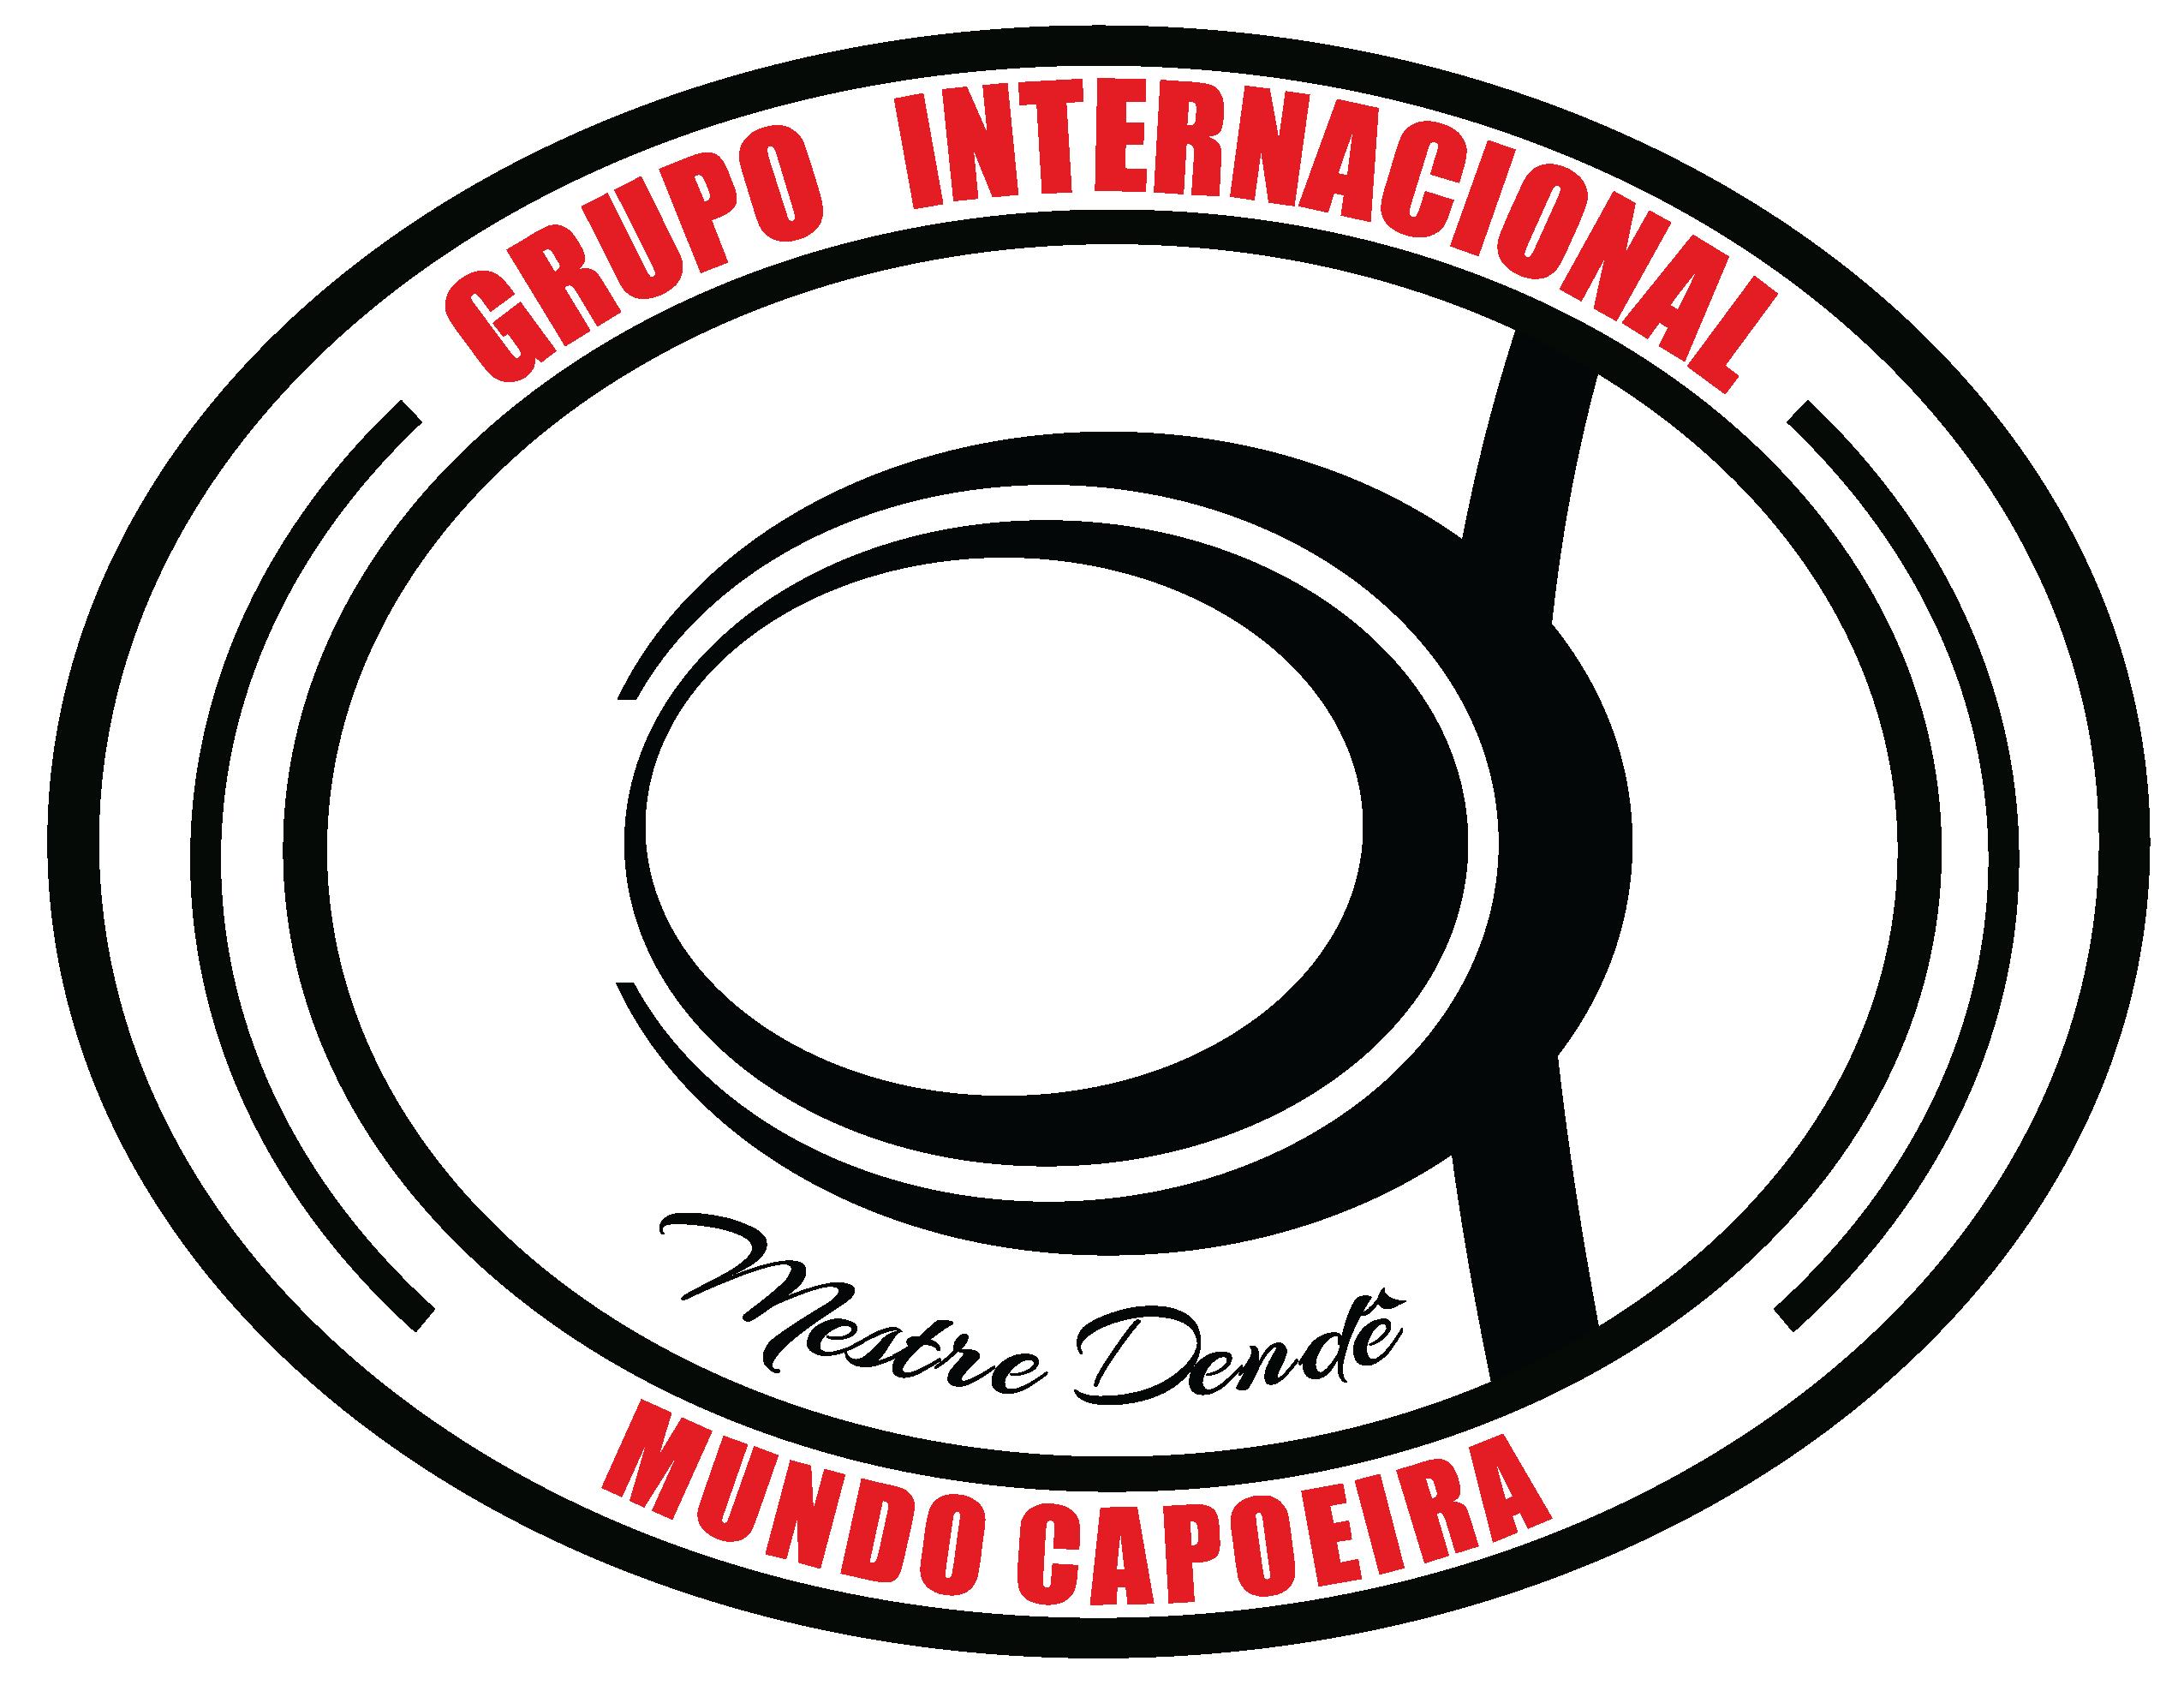 Logo Grupo Internacional Mundo Capoeira